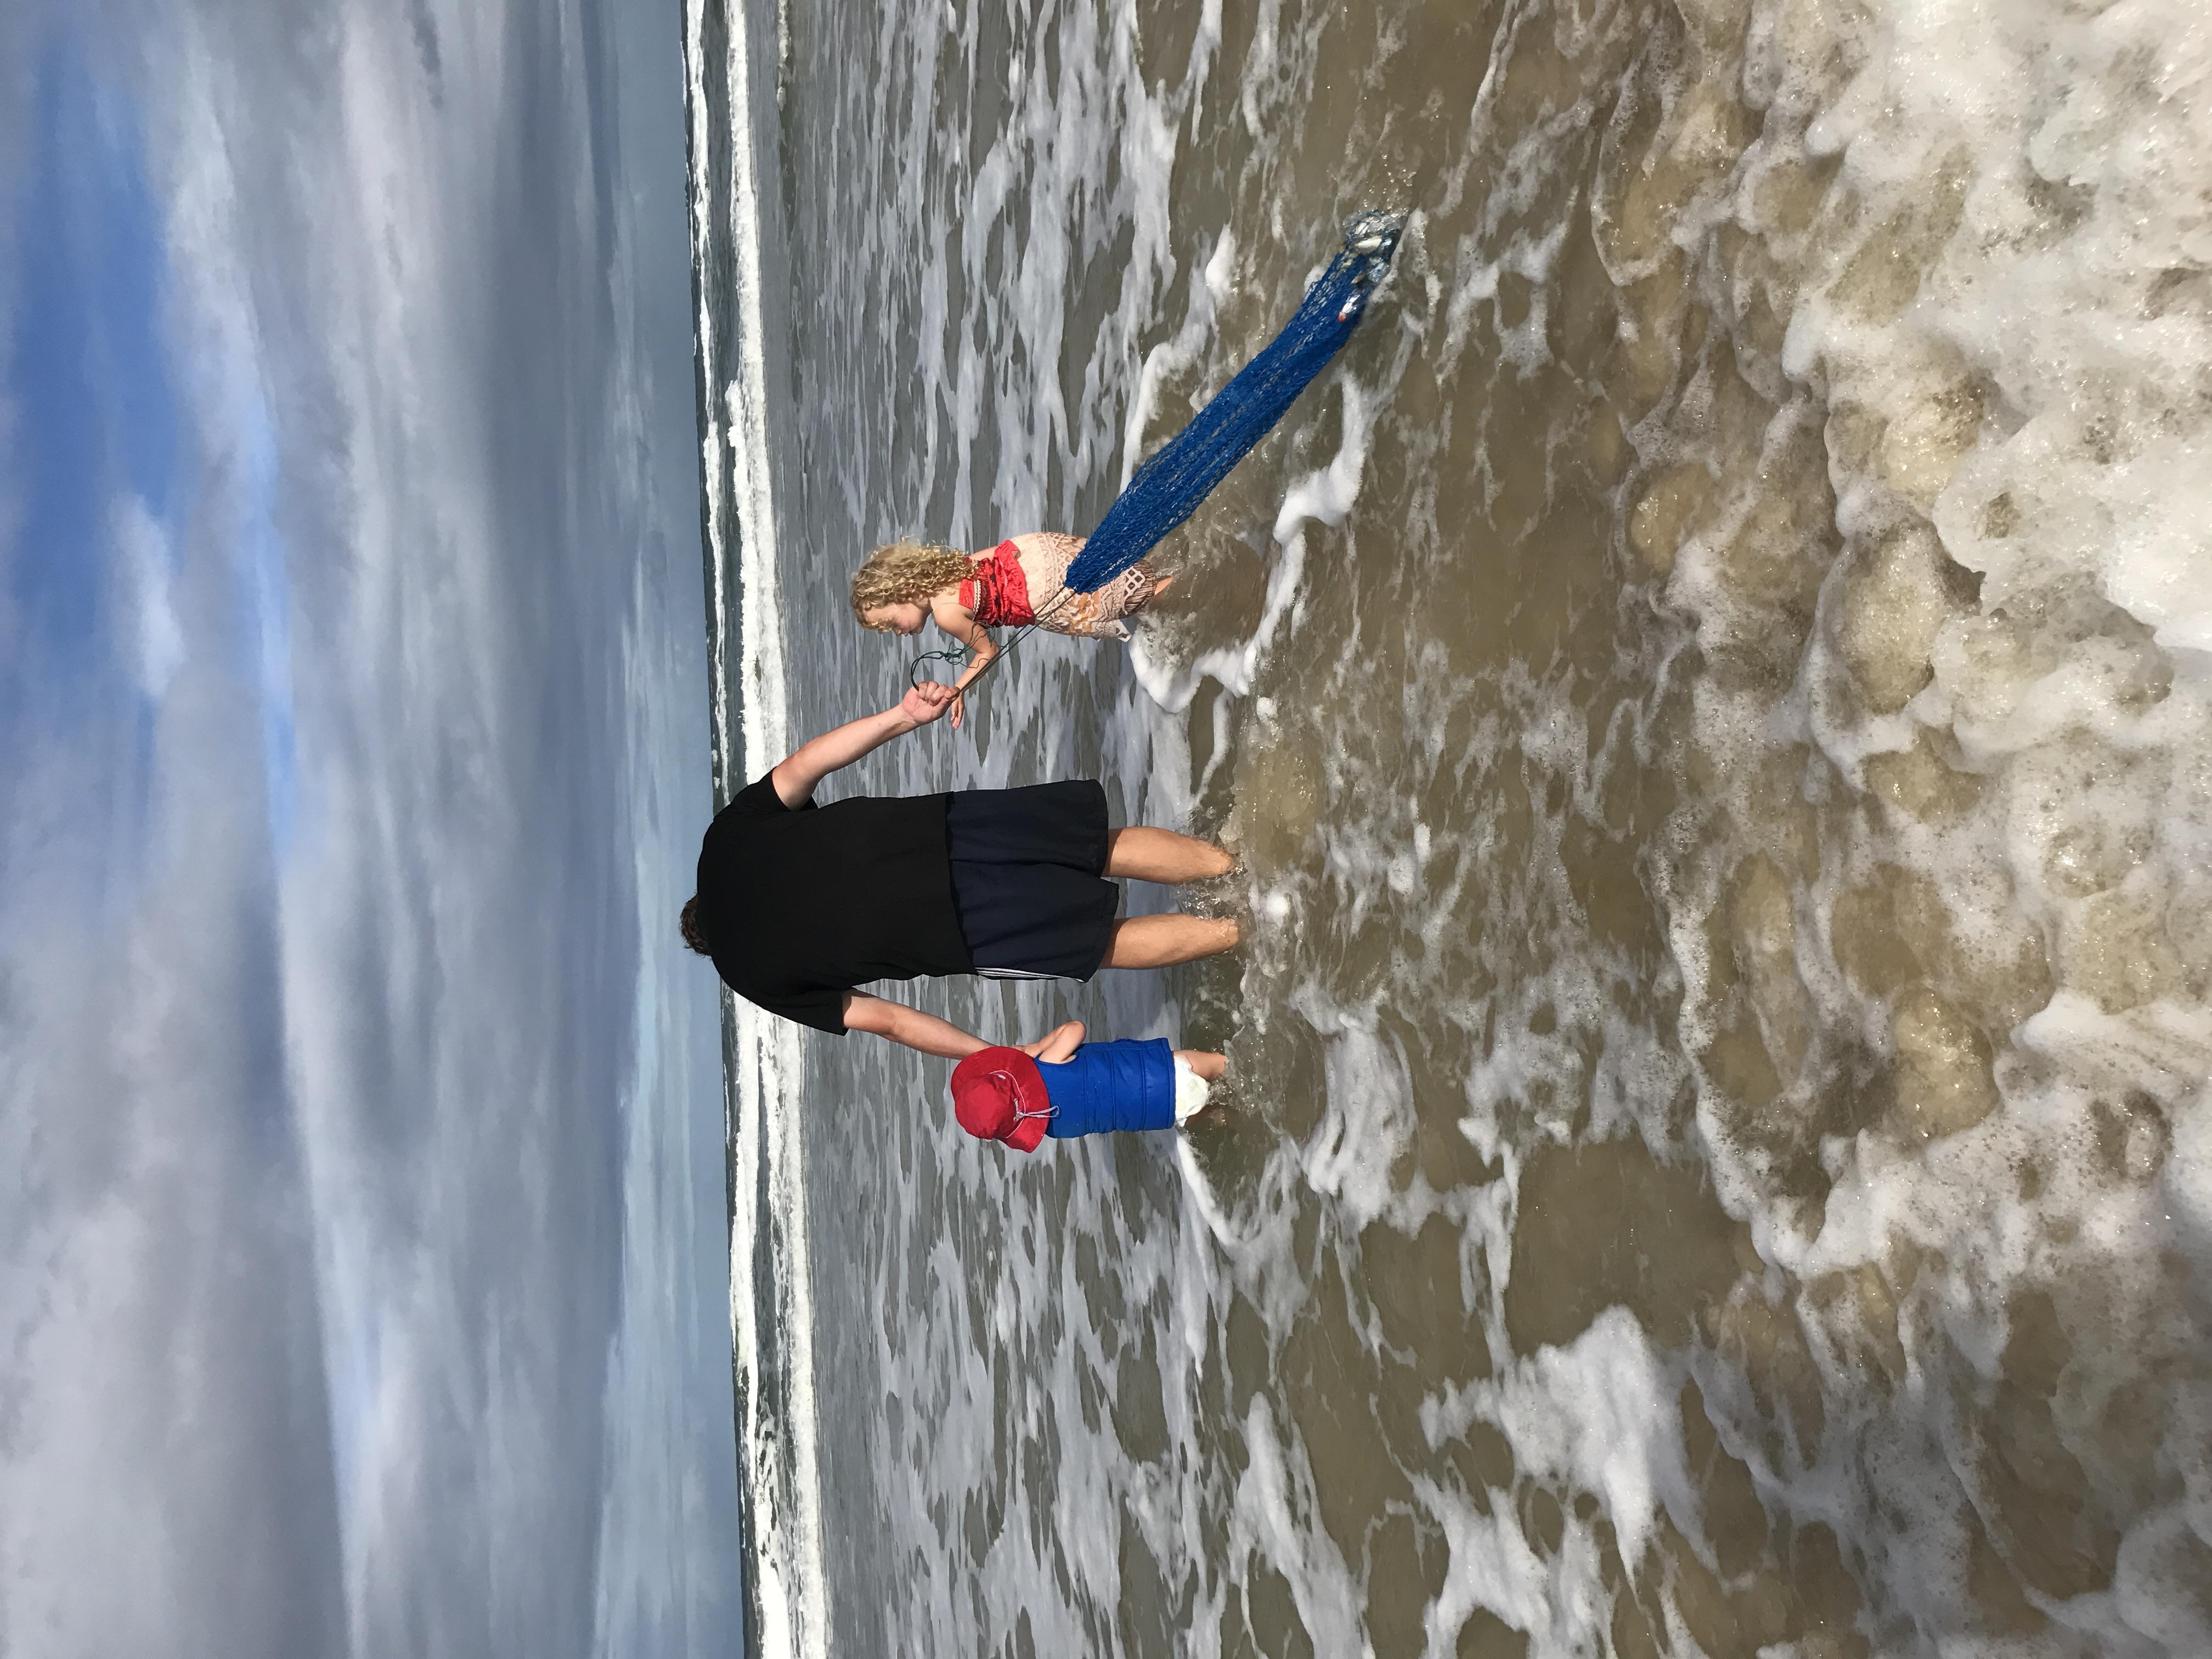 Beach worming on 75 Mile Beach